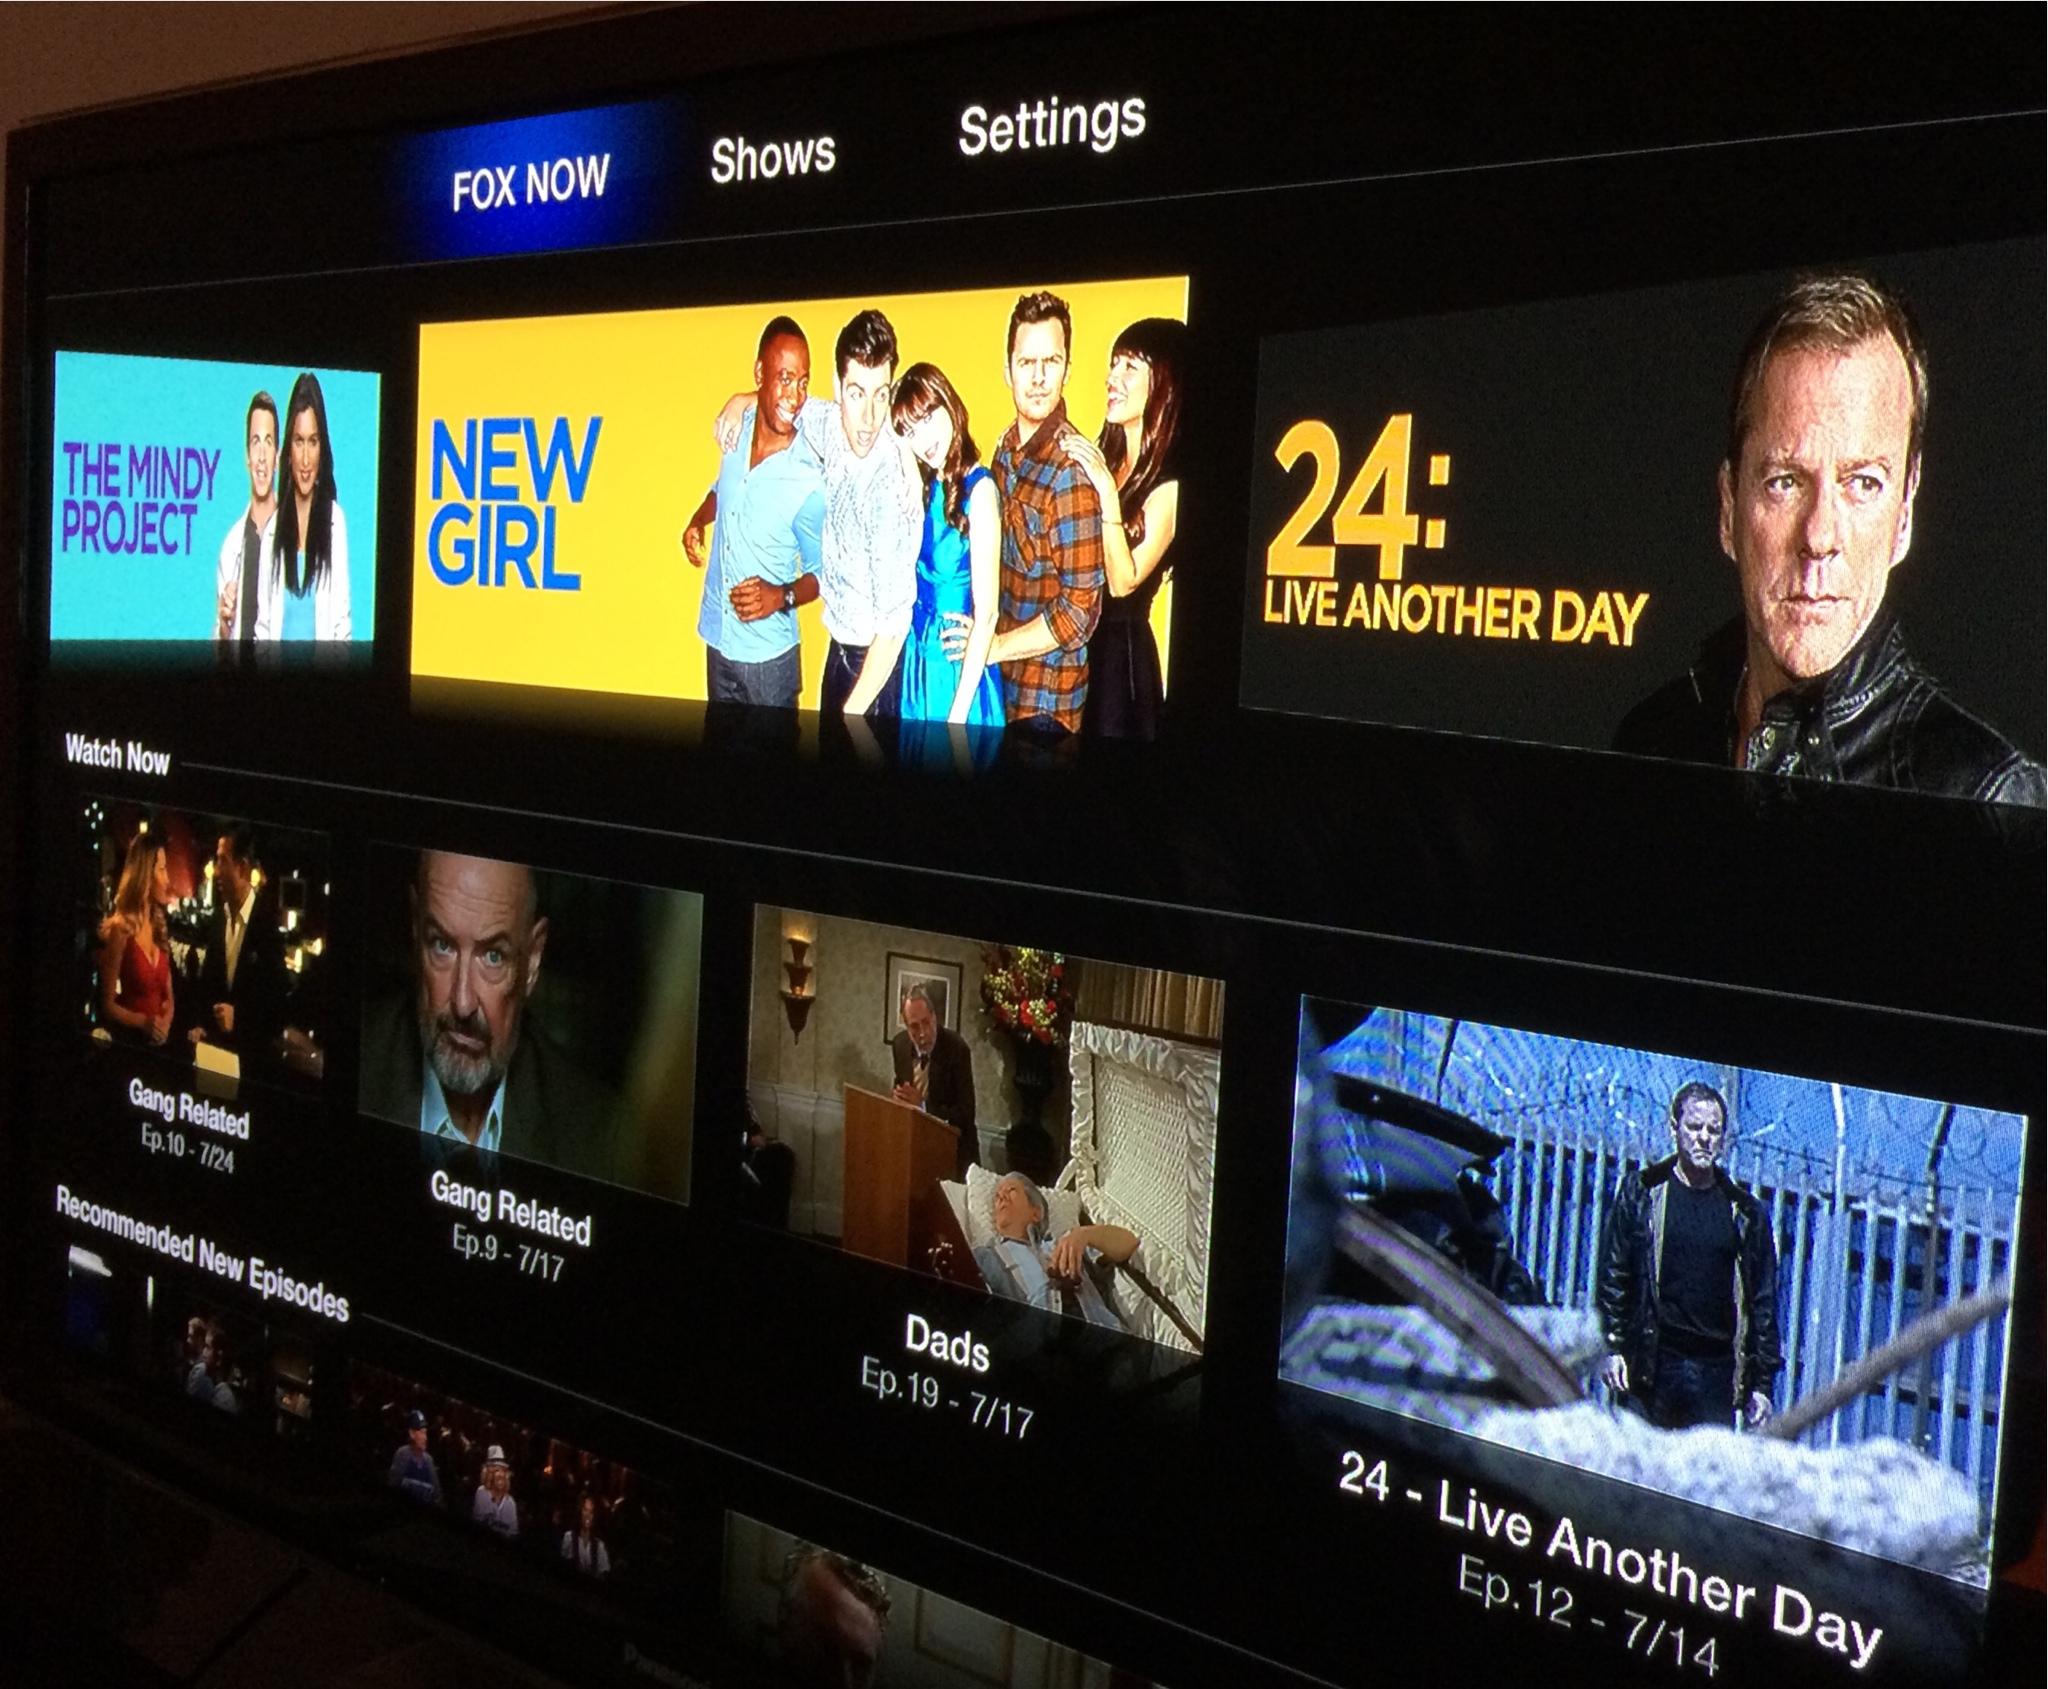 Apple TV (FOX NOW)